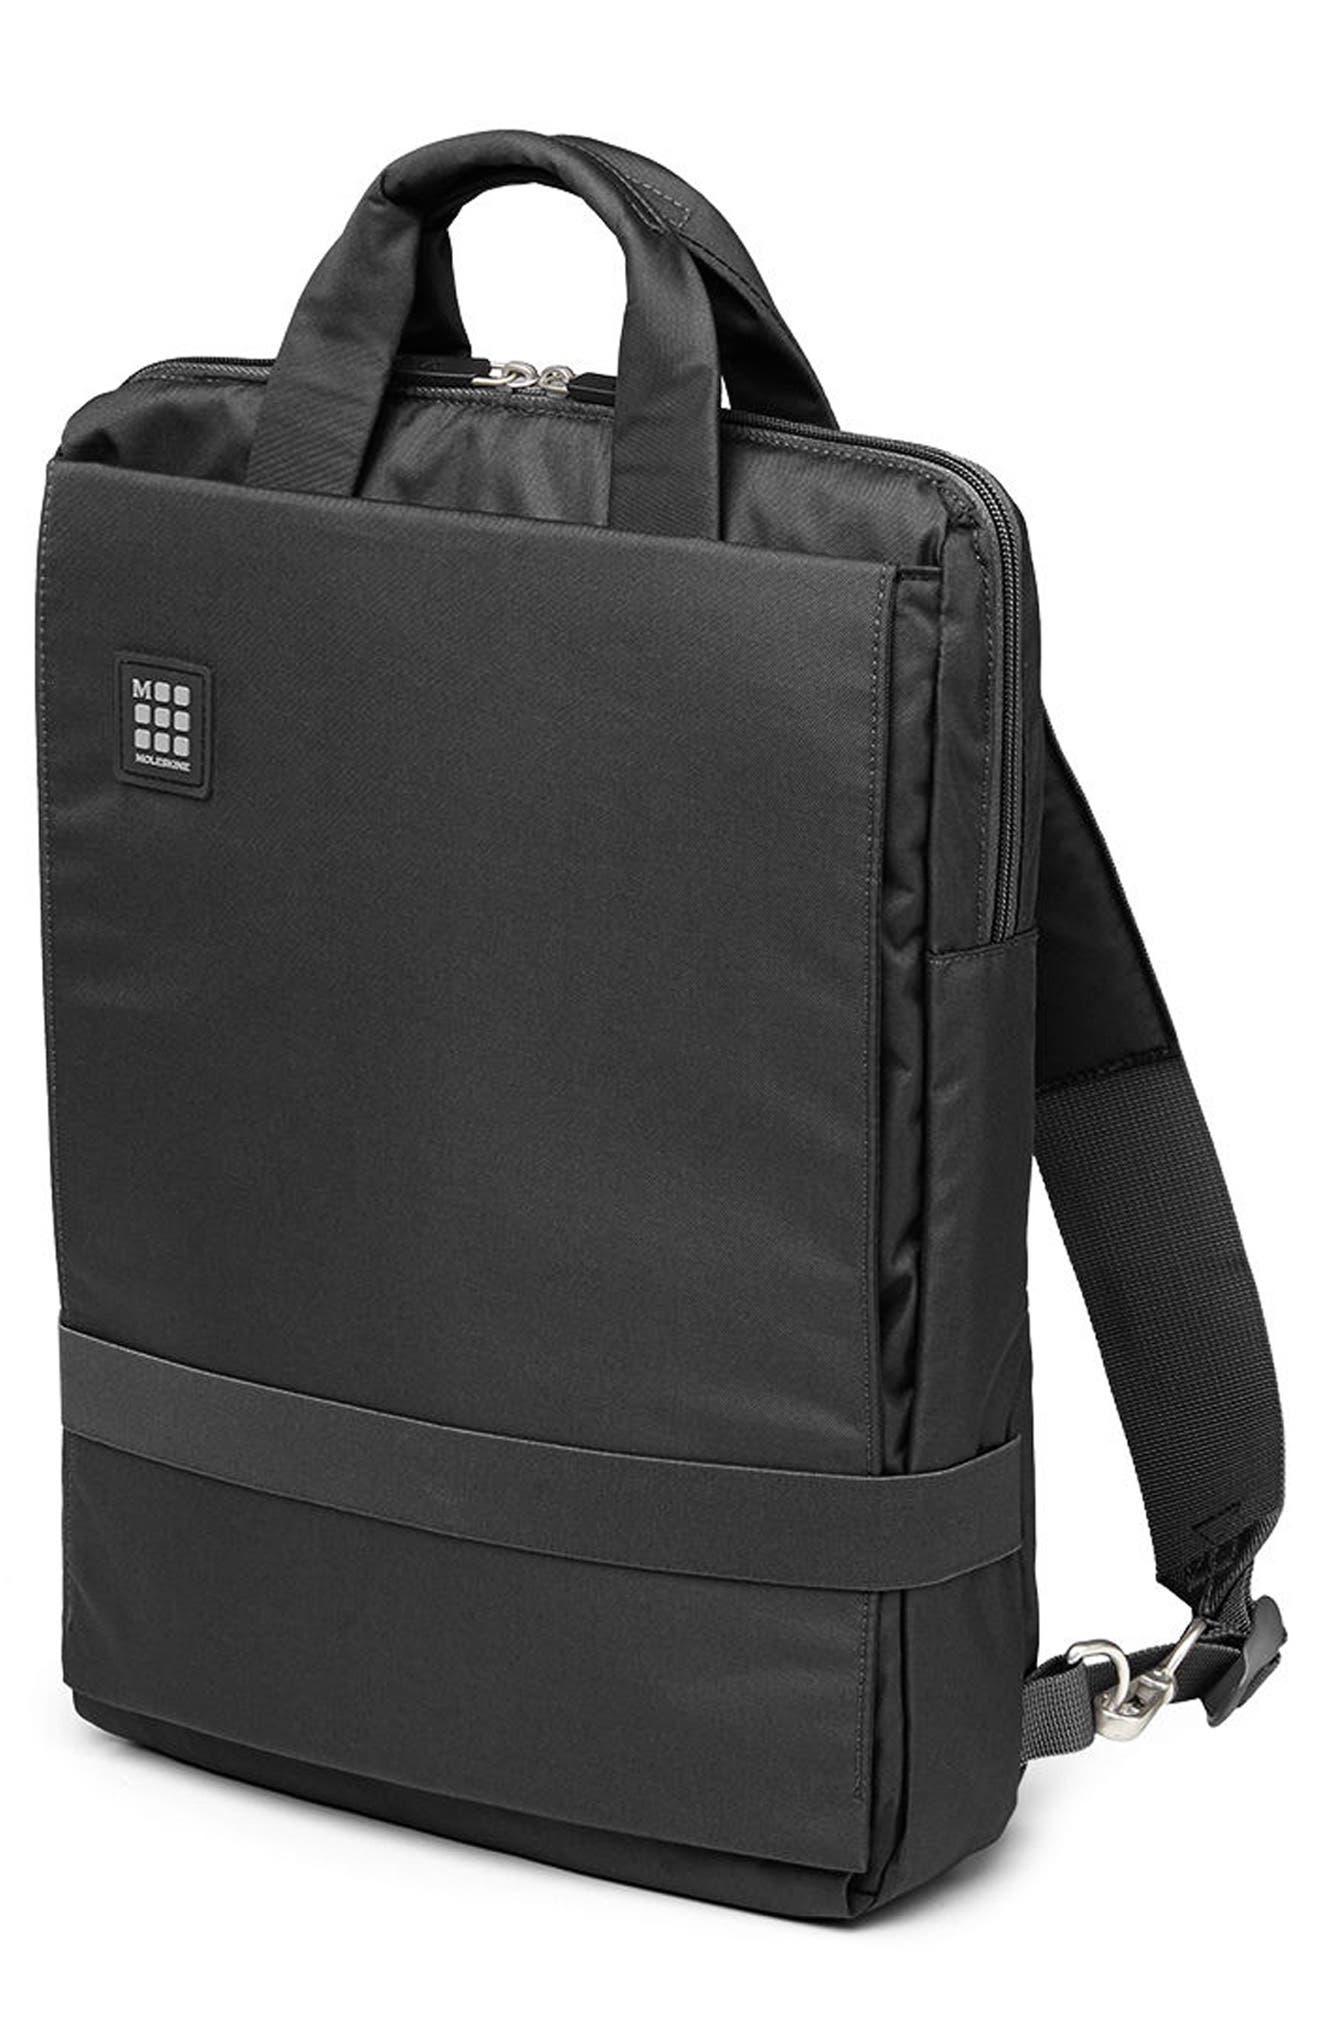 Alternate Image 1 Selected - Moleskine Vertical Device Bag